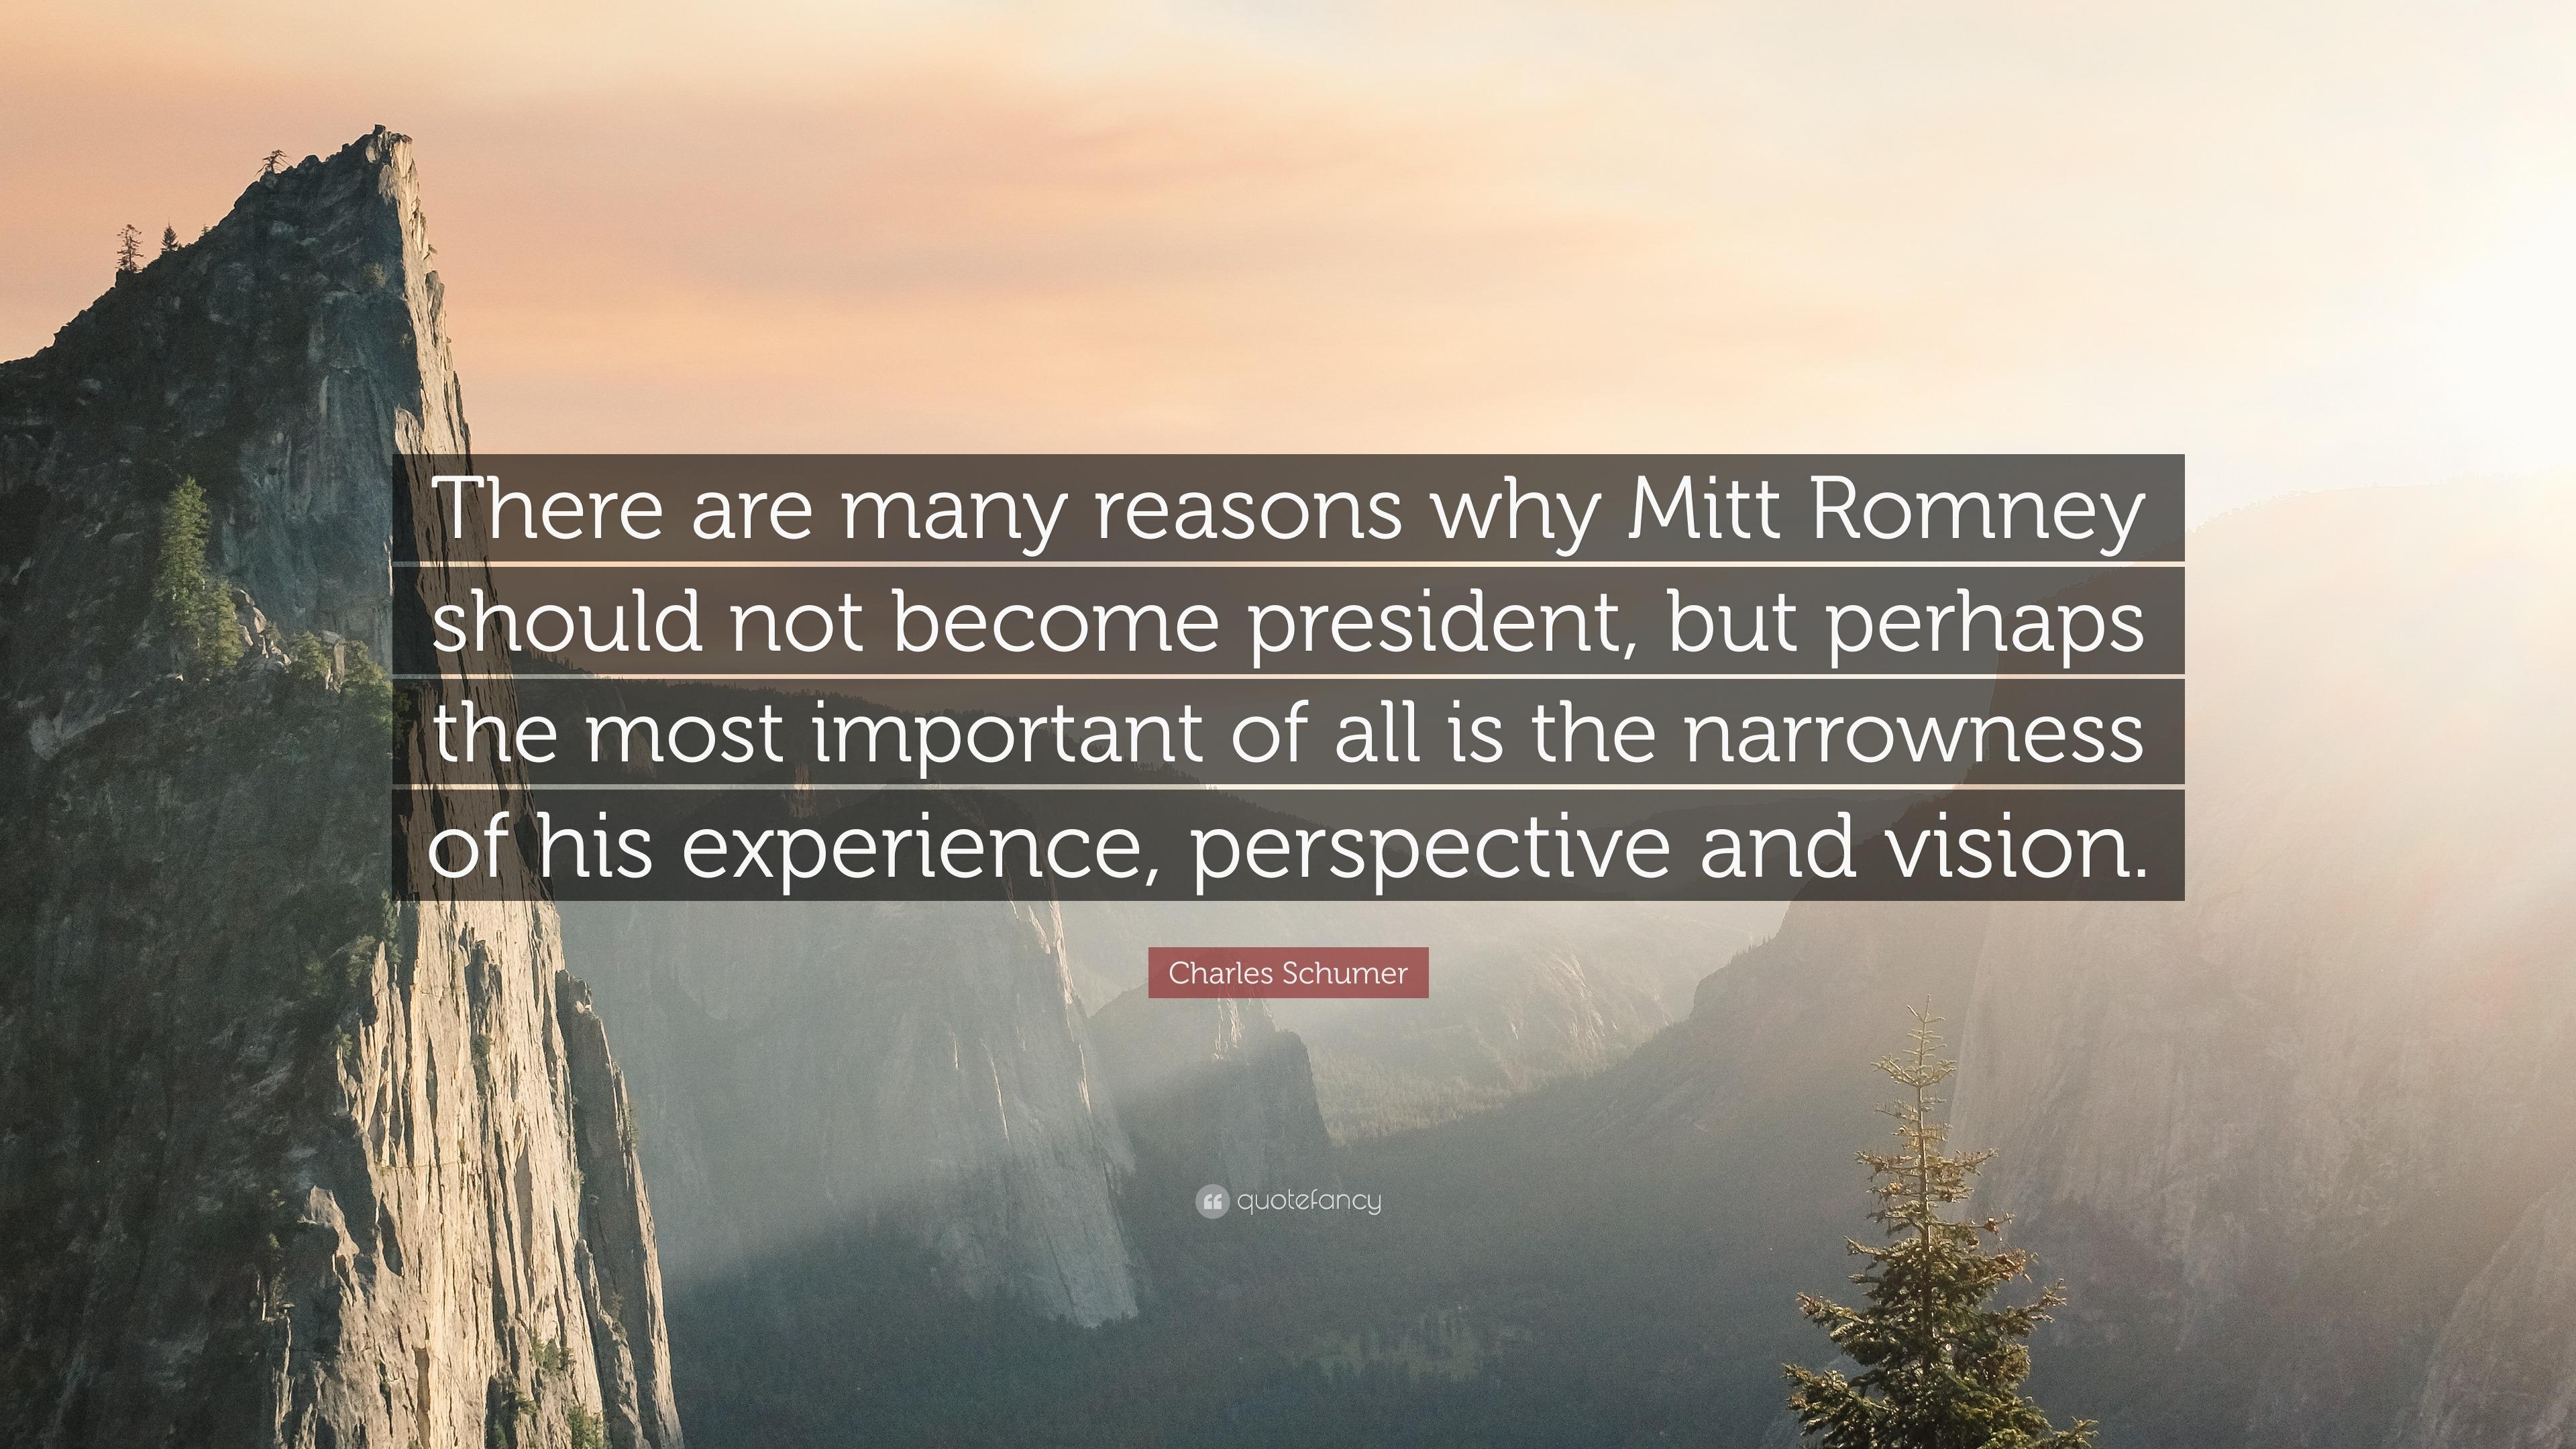 Essay on why mitt romney should be president